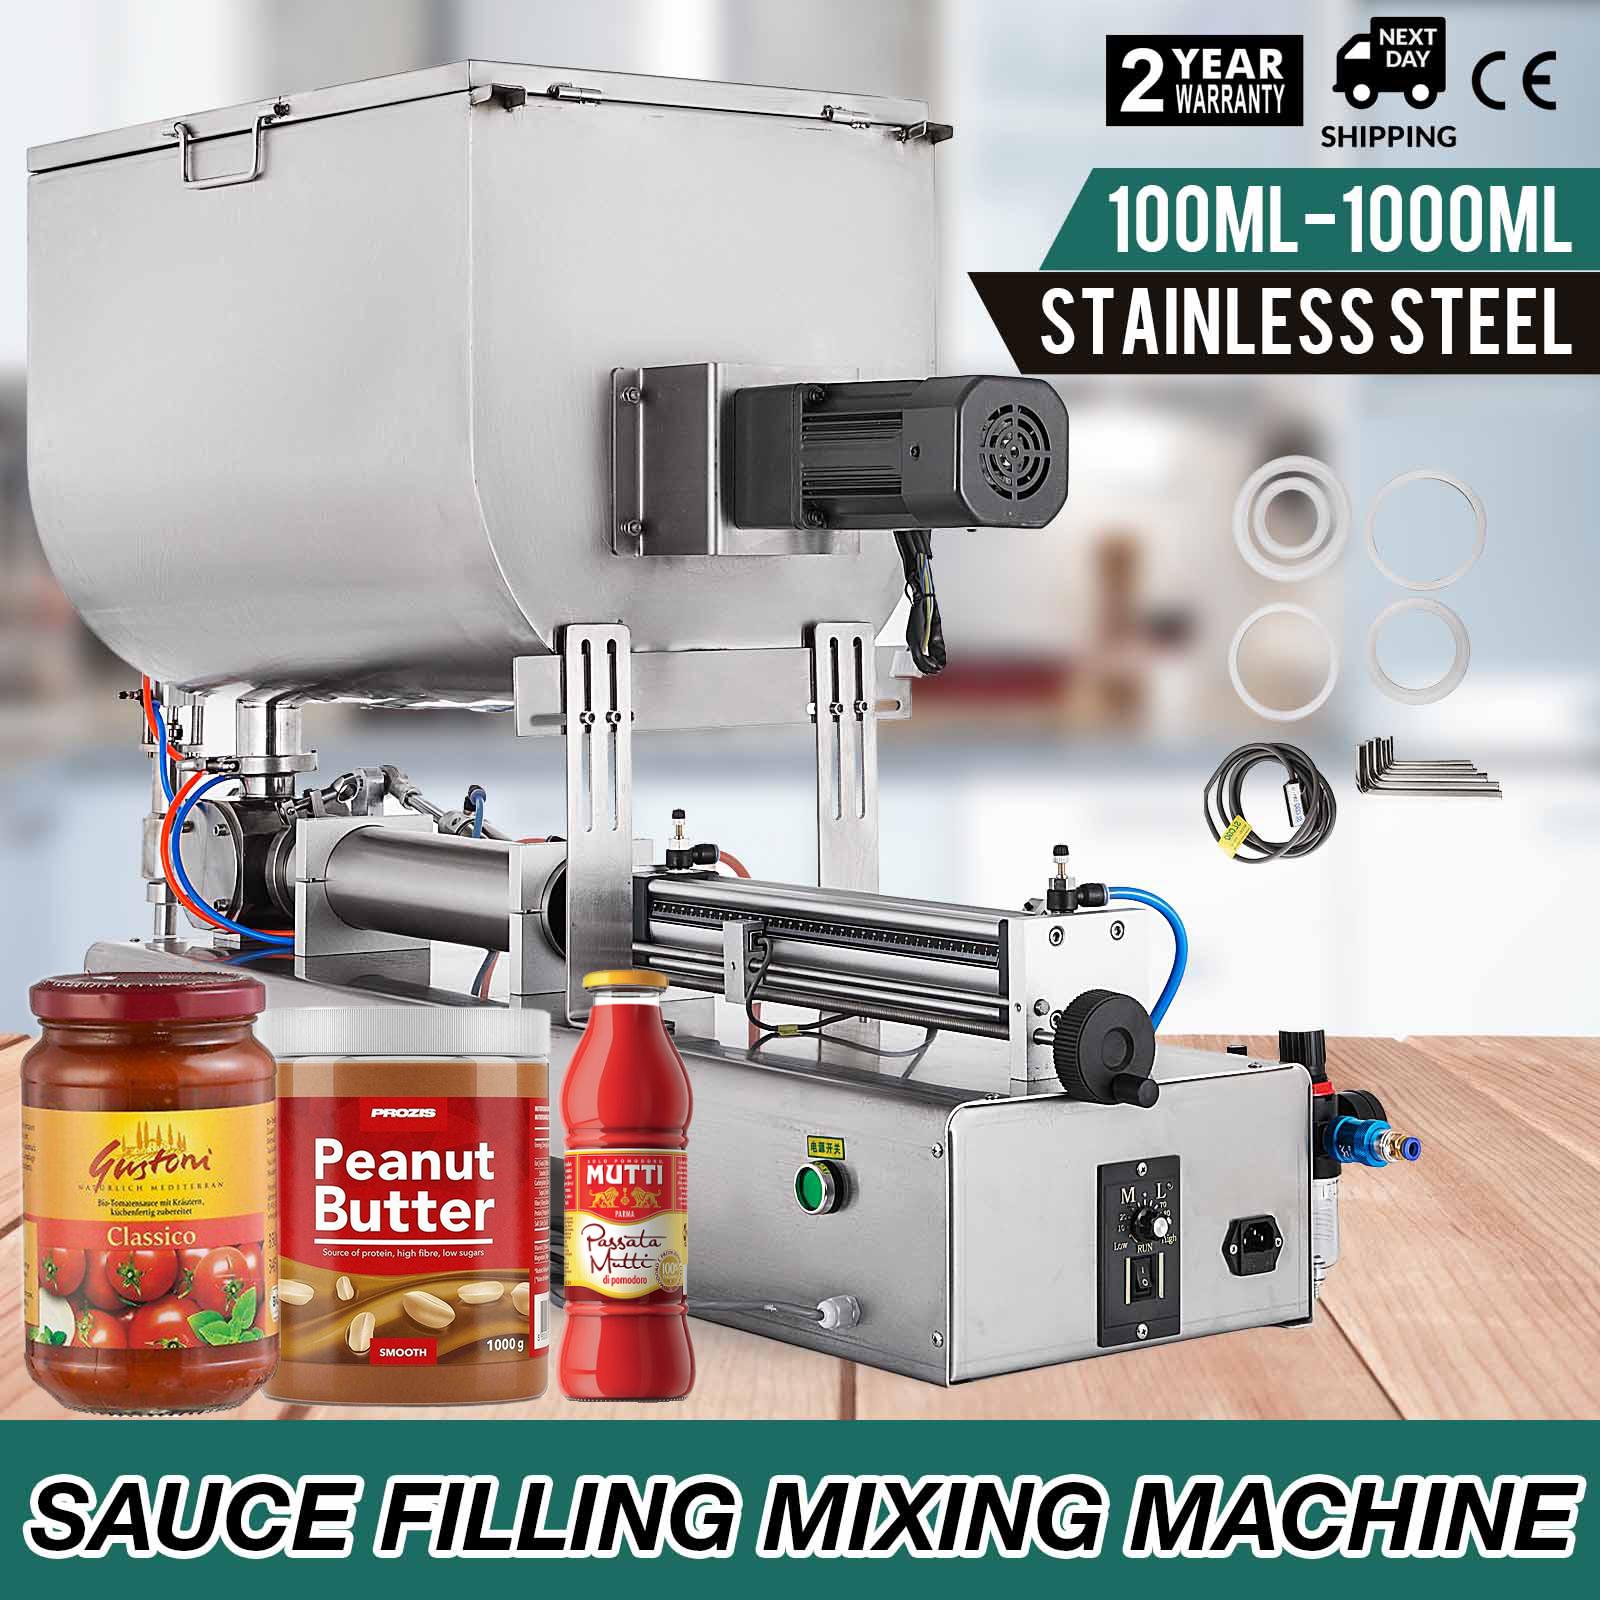 Liquid-Filling-Machine-Filler-Remplissage-2-3500ML-50-500ML-INDUSTRY-SUPPLY miniature 85